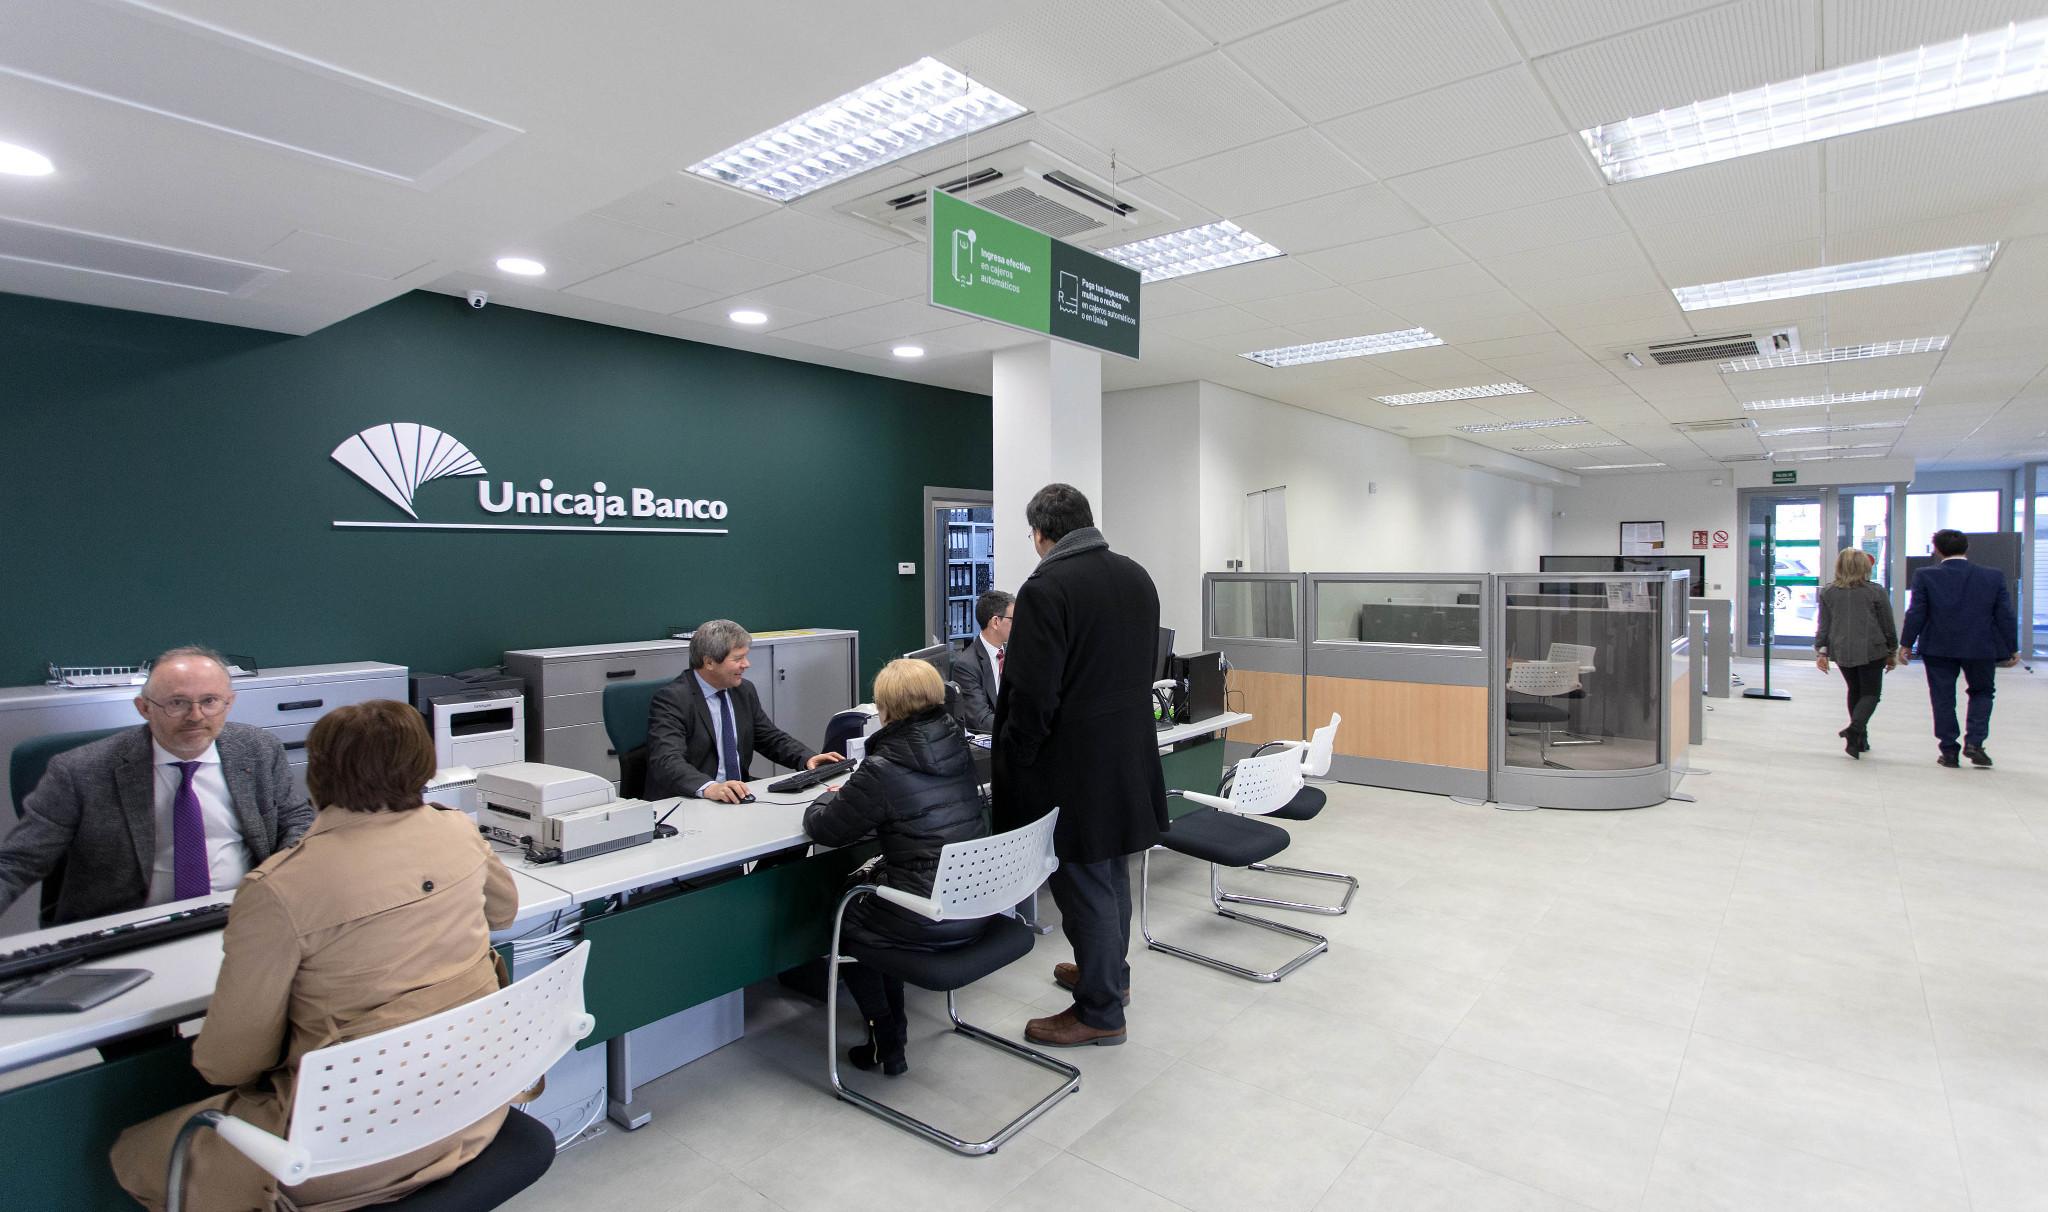 unicaja banco lanza un servicio para unificar seguros